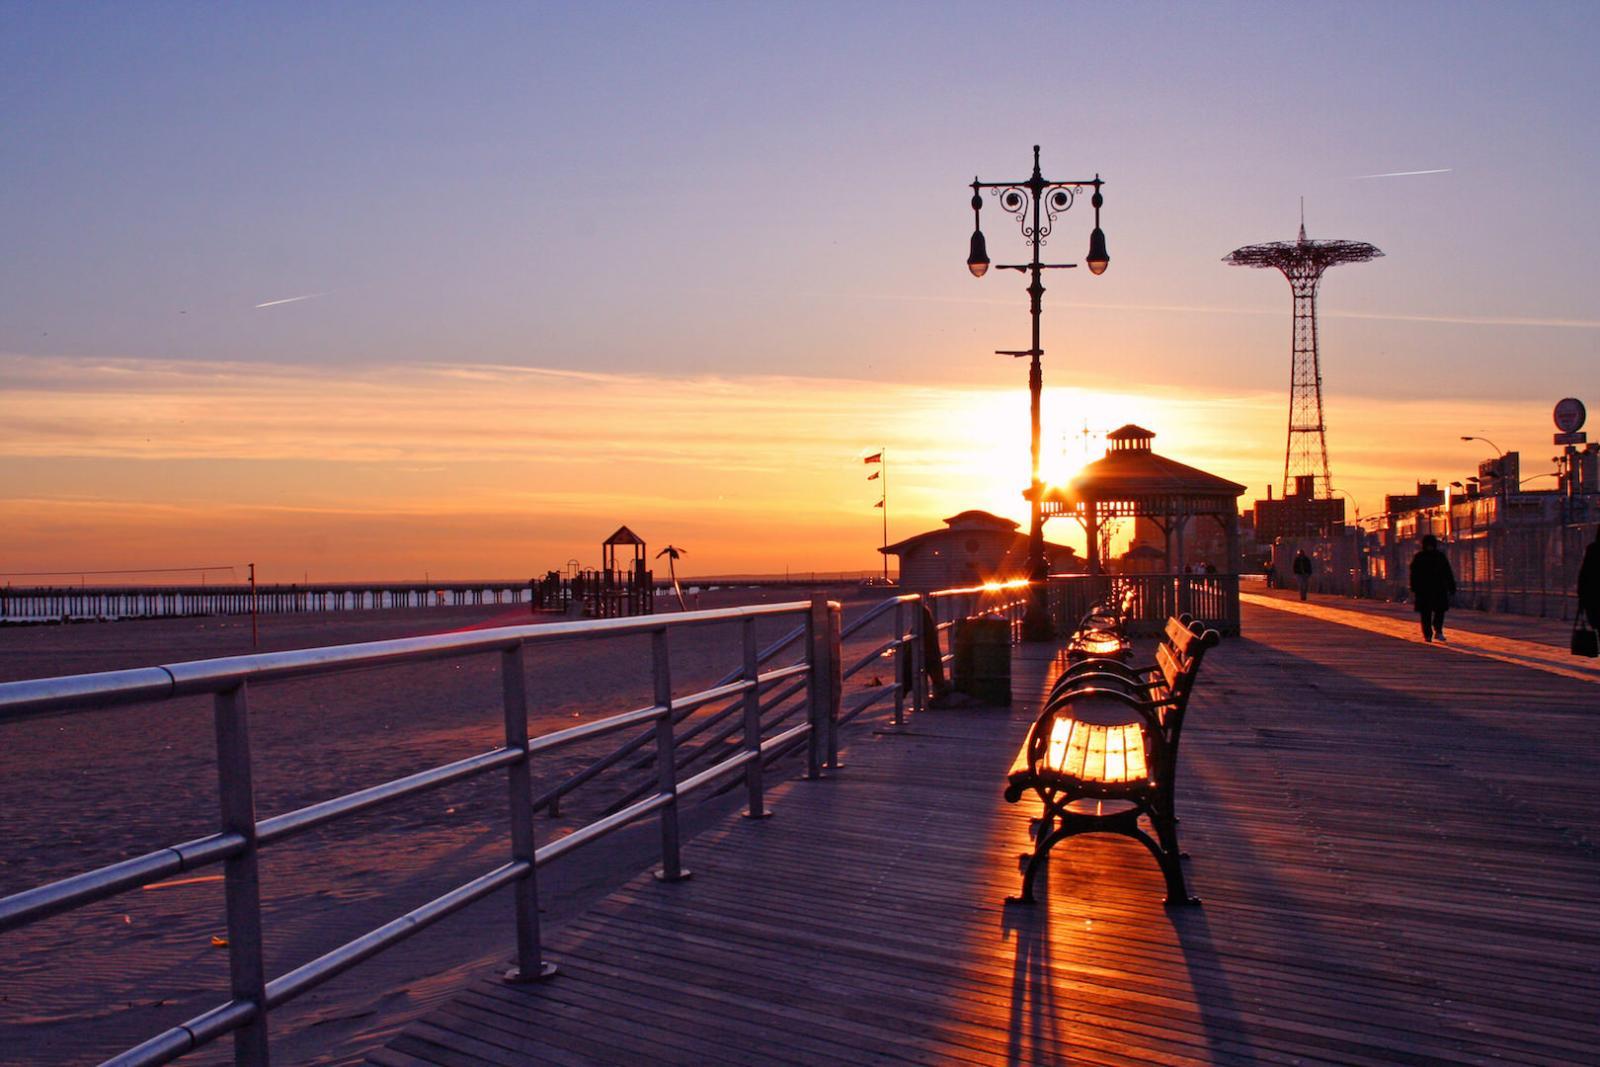 Die Coney Island Promenade bei Sonnenuntergang